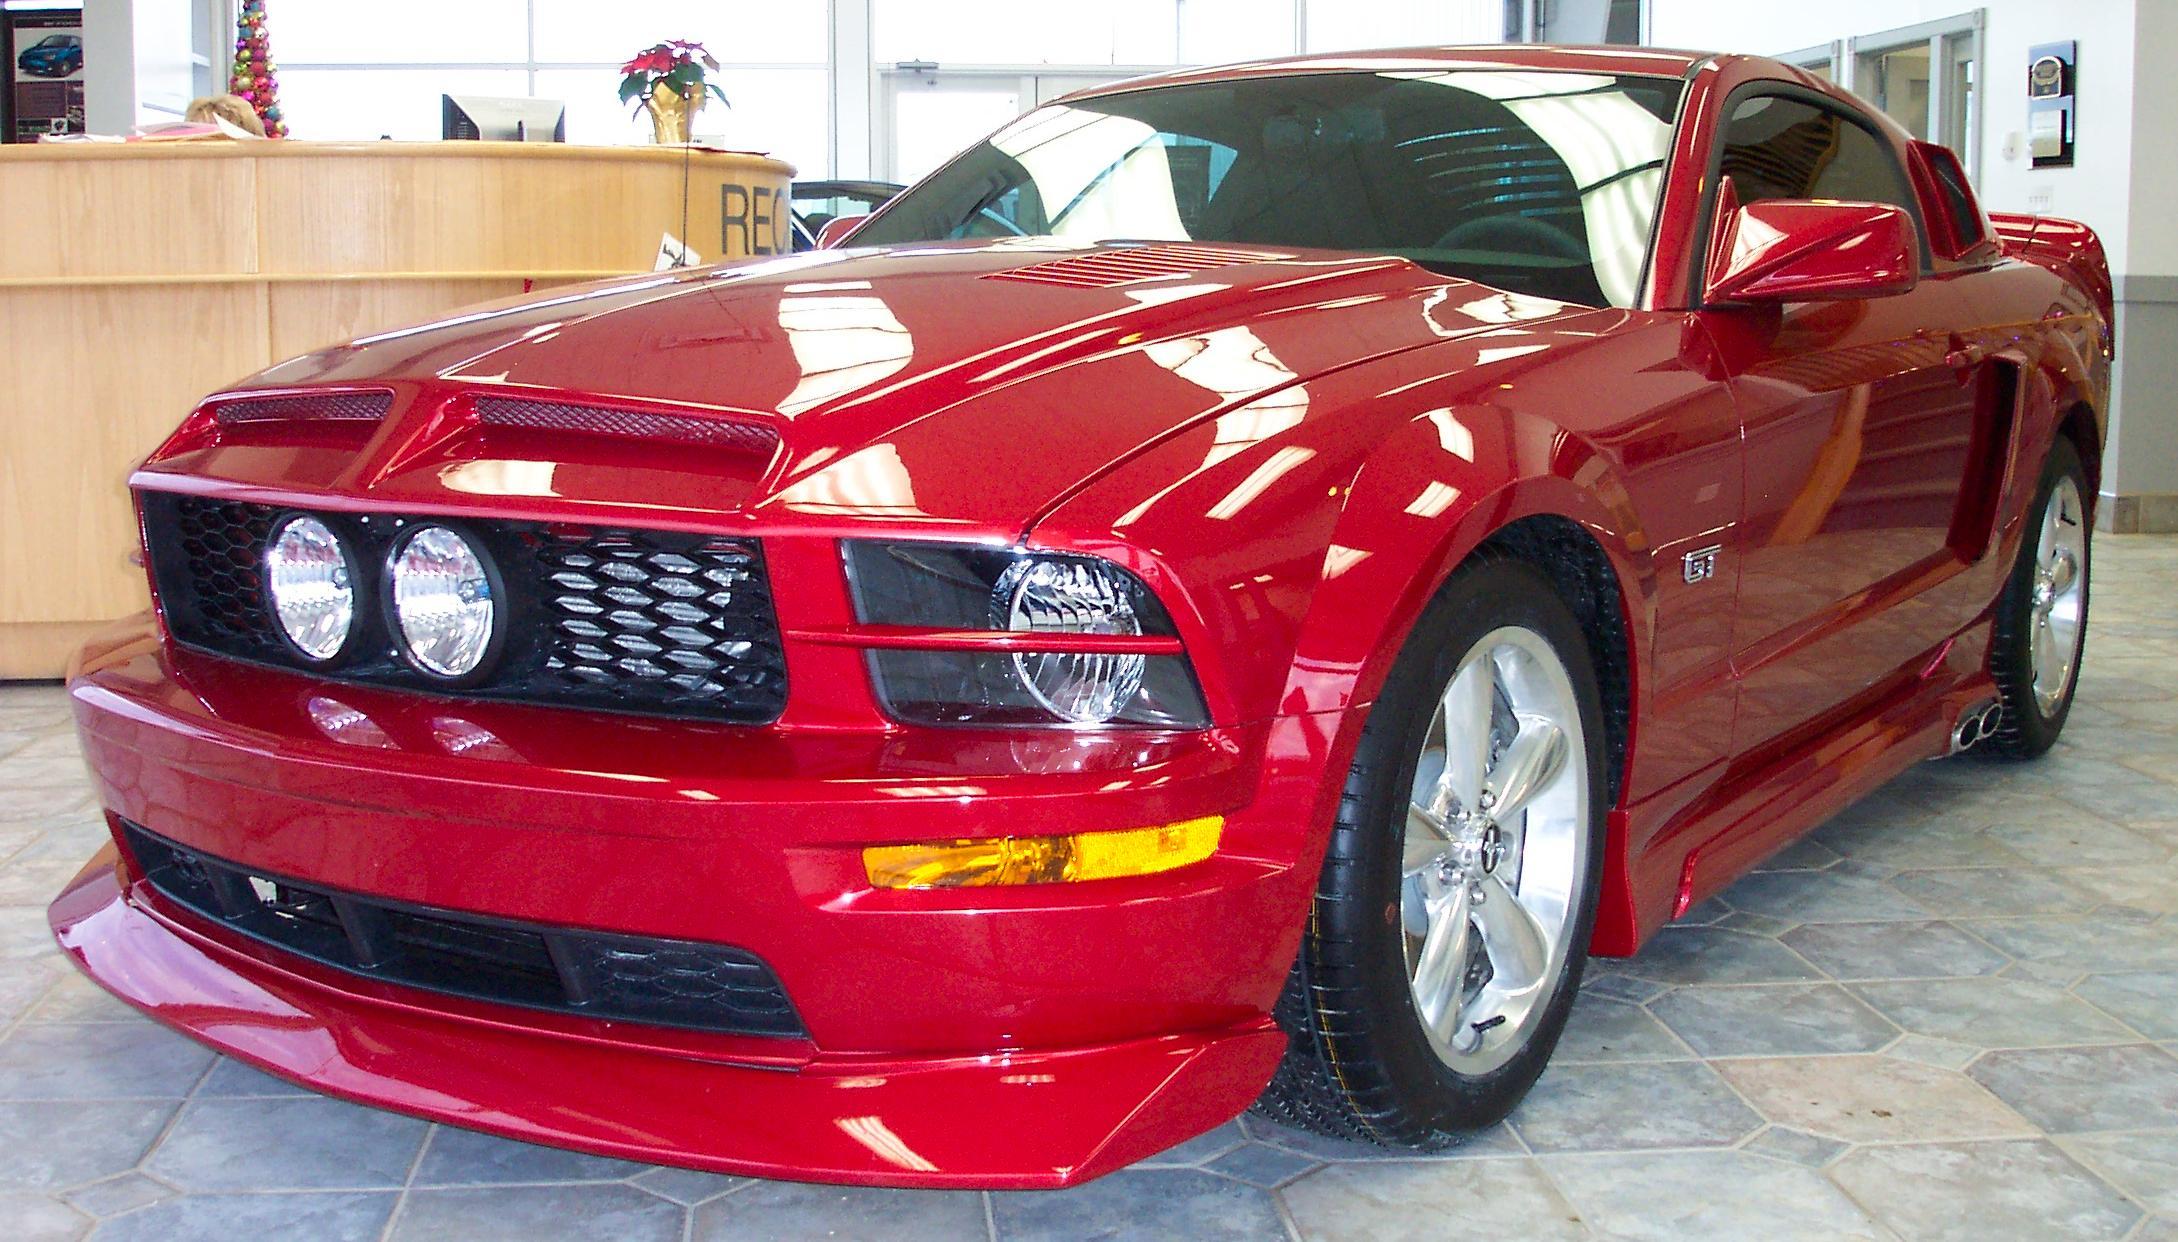 2008 Retro Mach 1